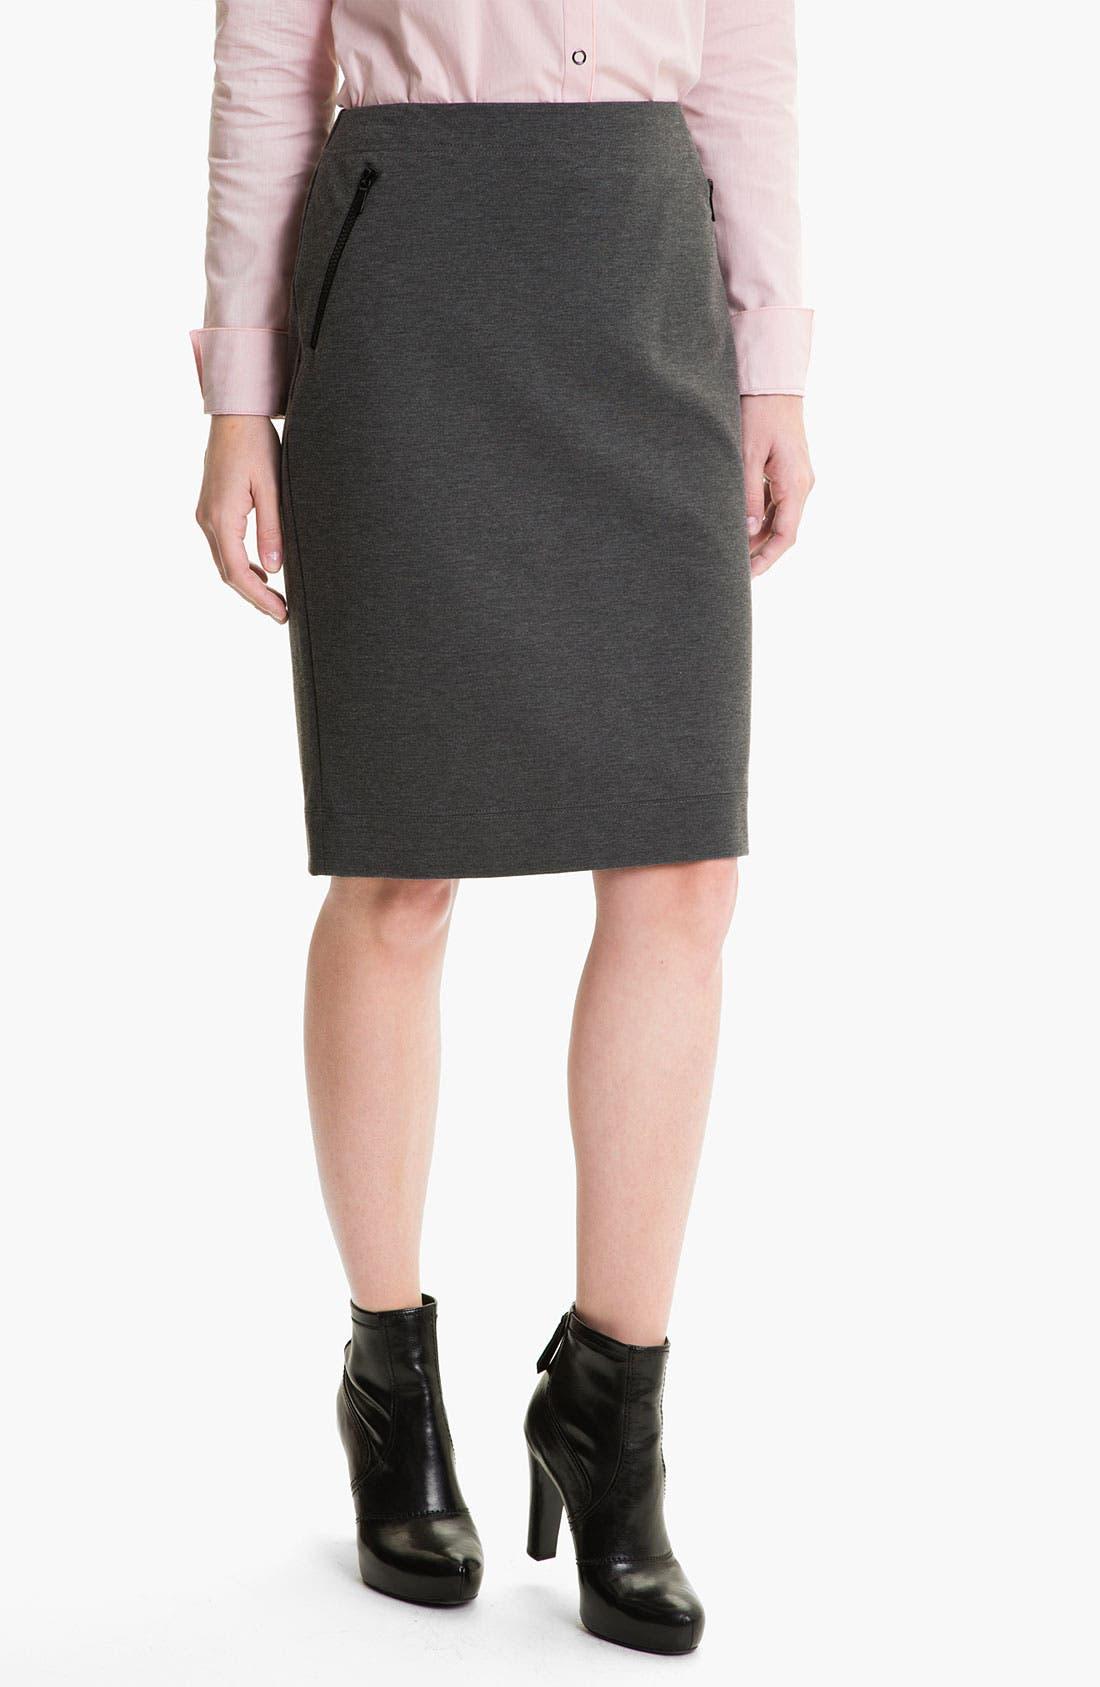 Alternate Image 1 Selected - Lafayette 148 New York Heather Ponte Skirt